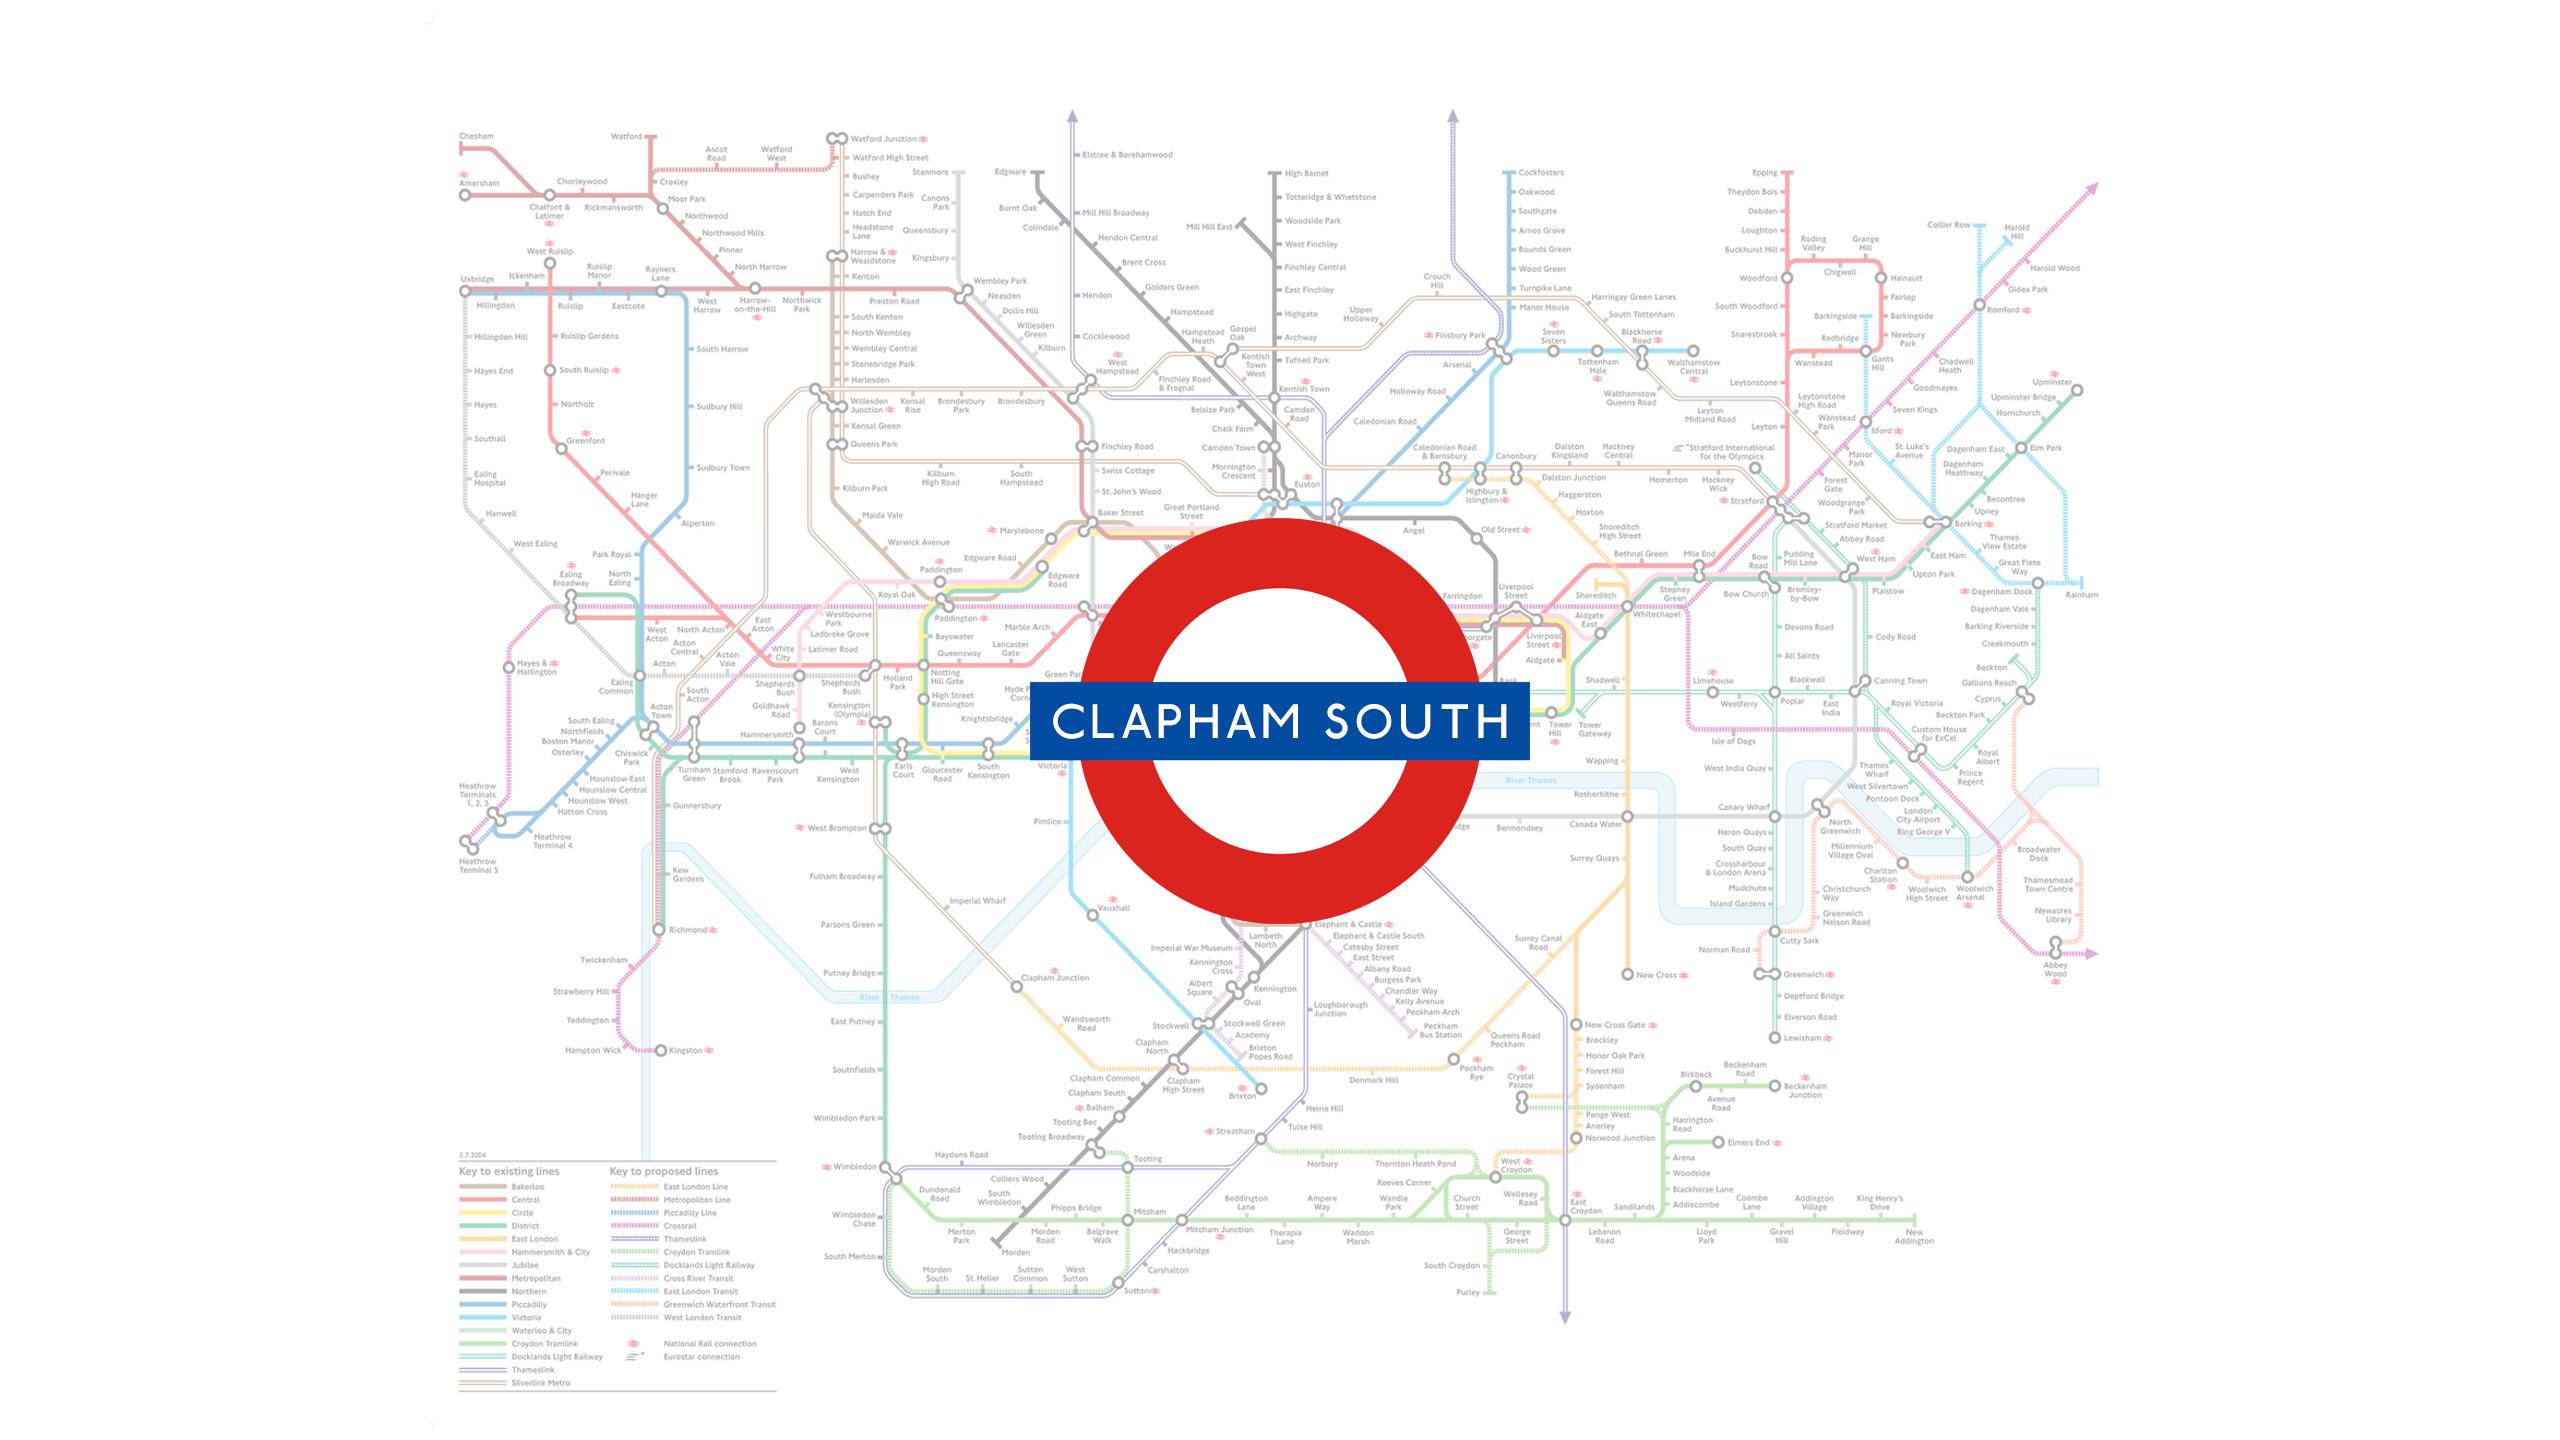 Clapham South (Map)